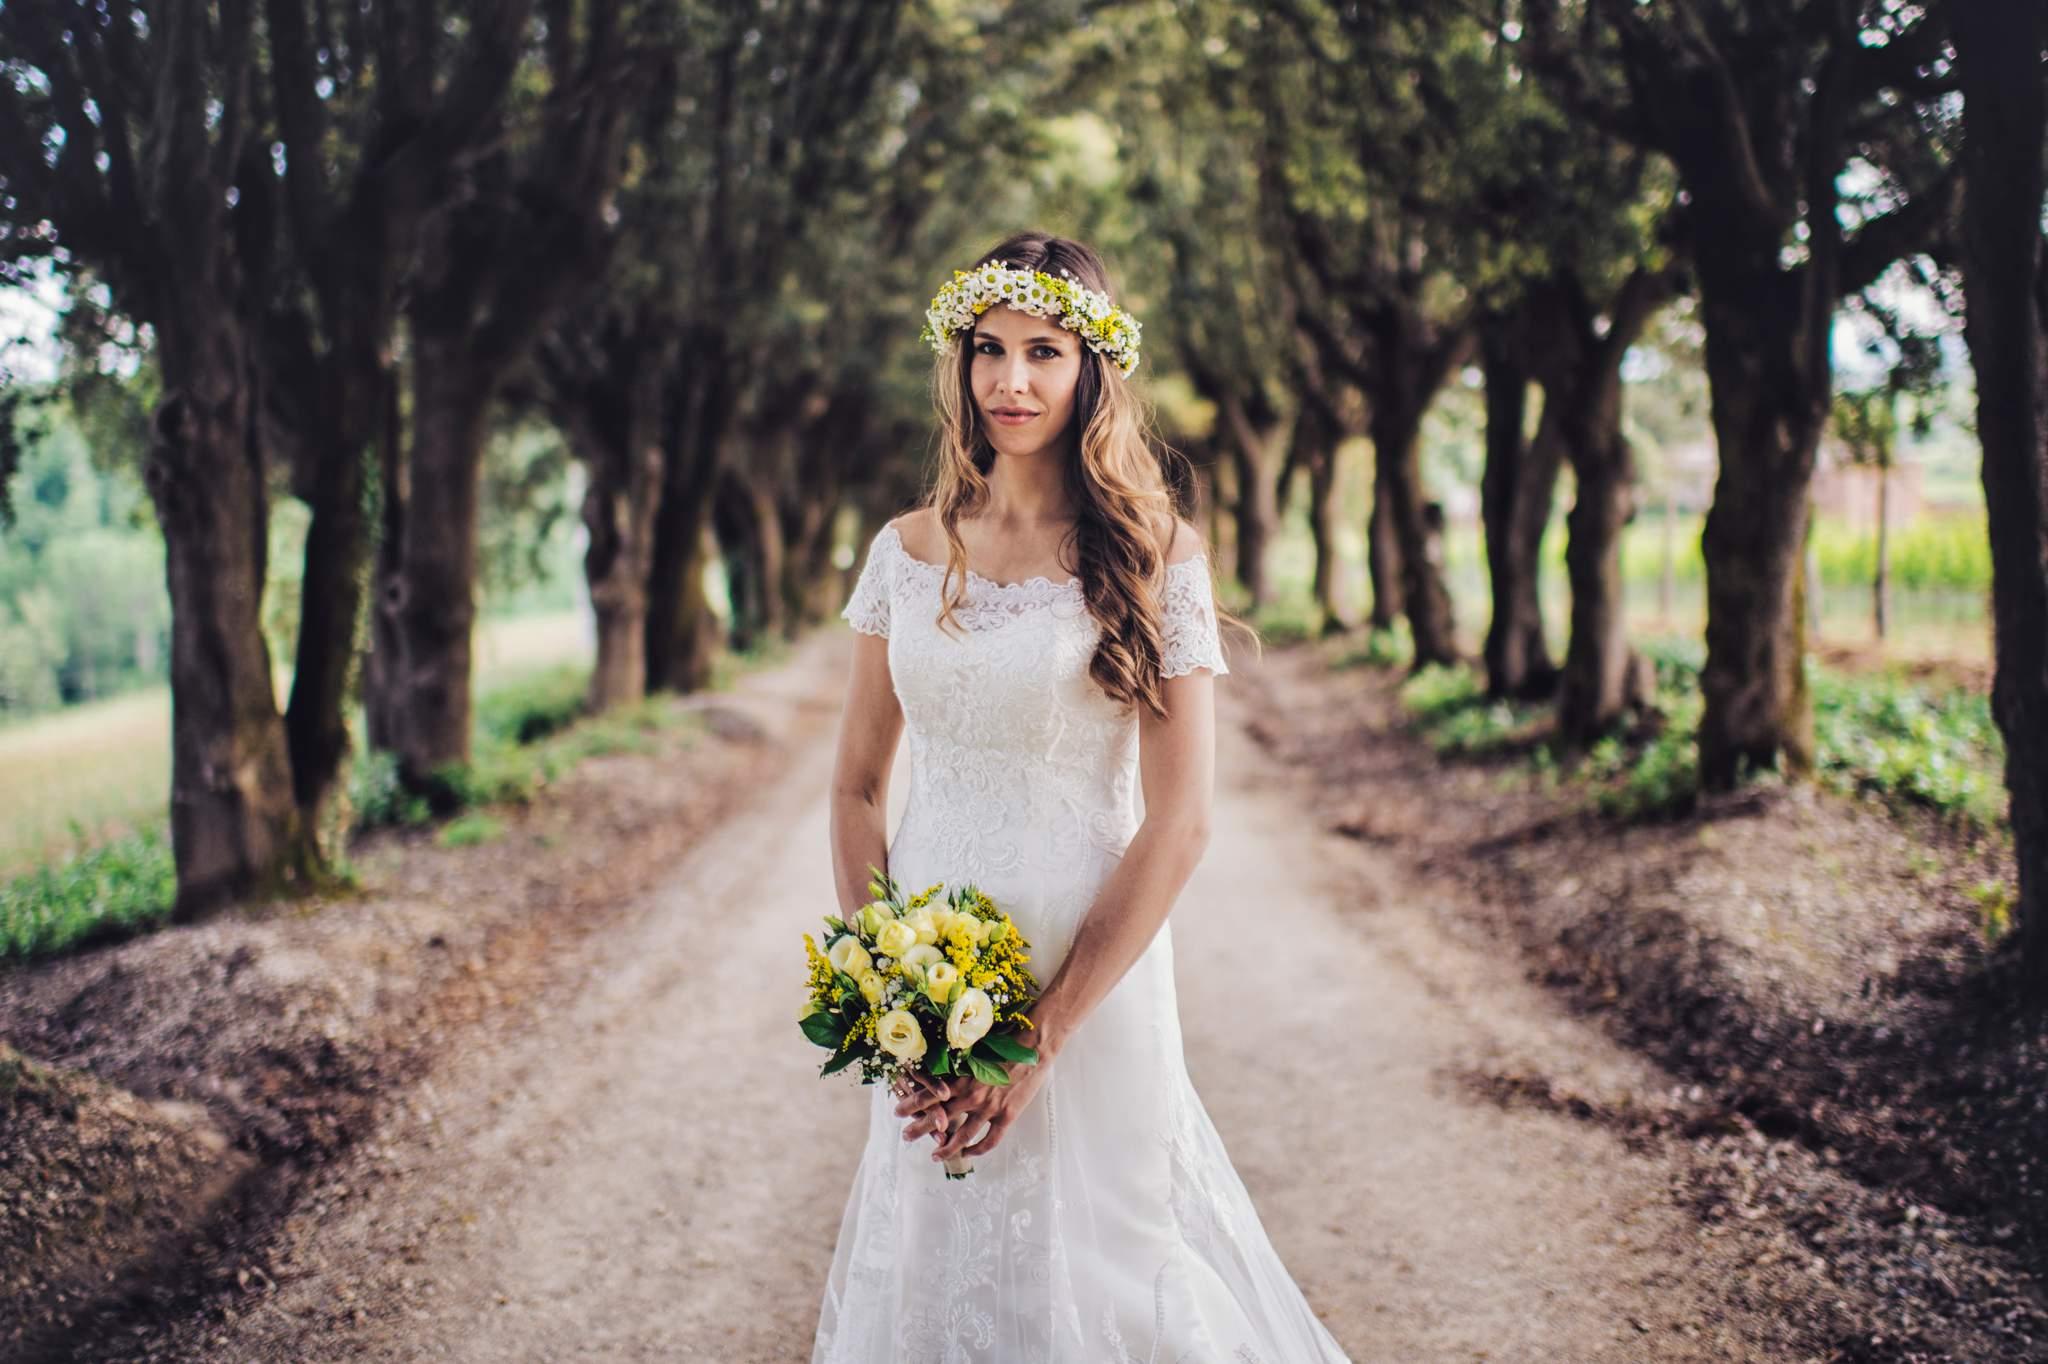 35wedding-photographer-tuscany-siena